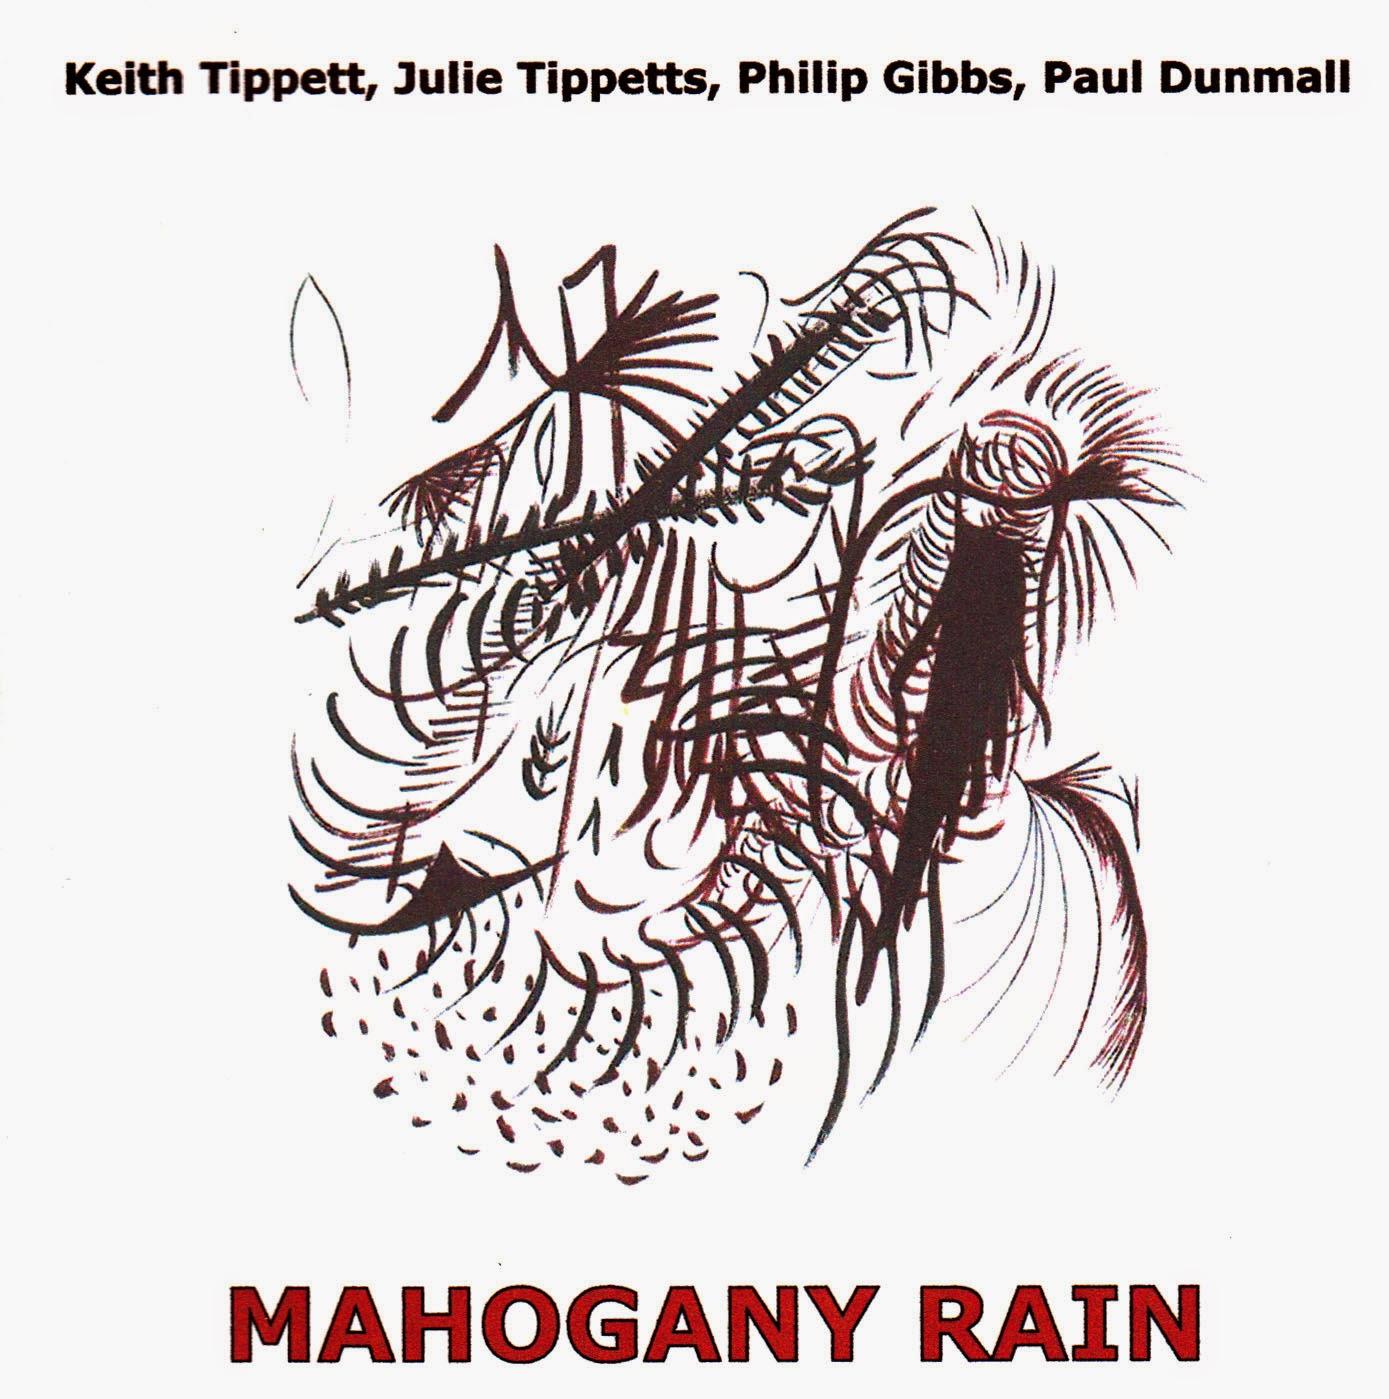 KEITH AND JULIE TIPPETT - Mahogany Rain cover